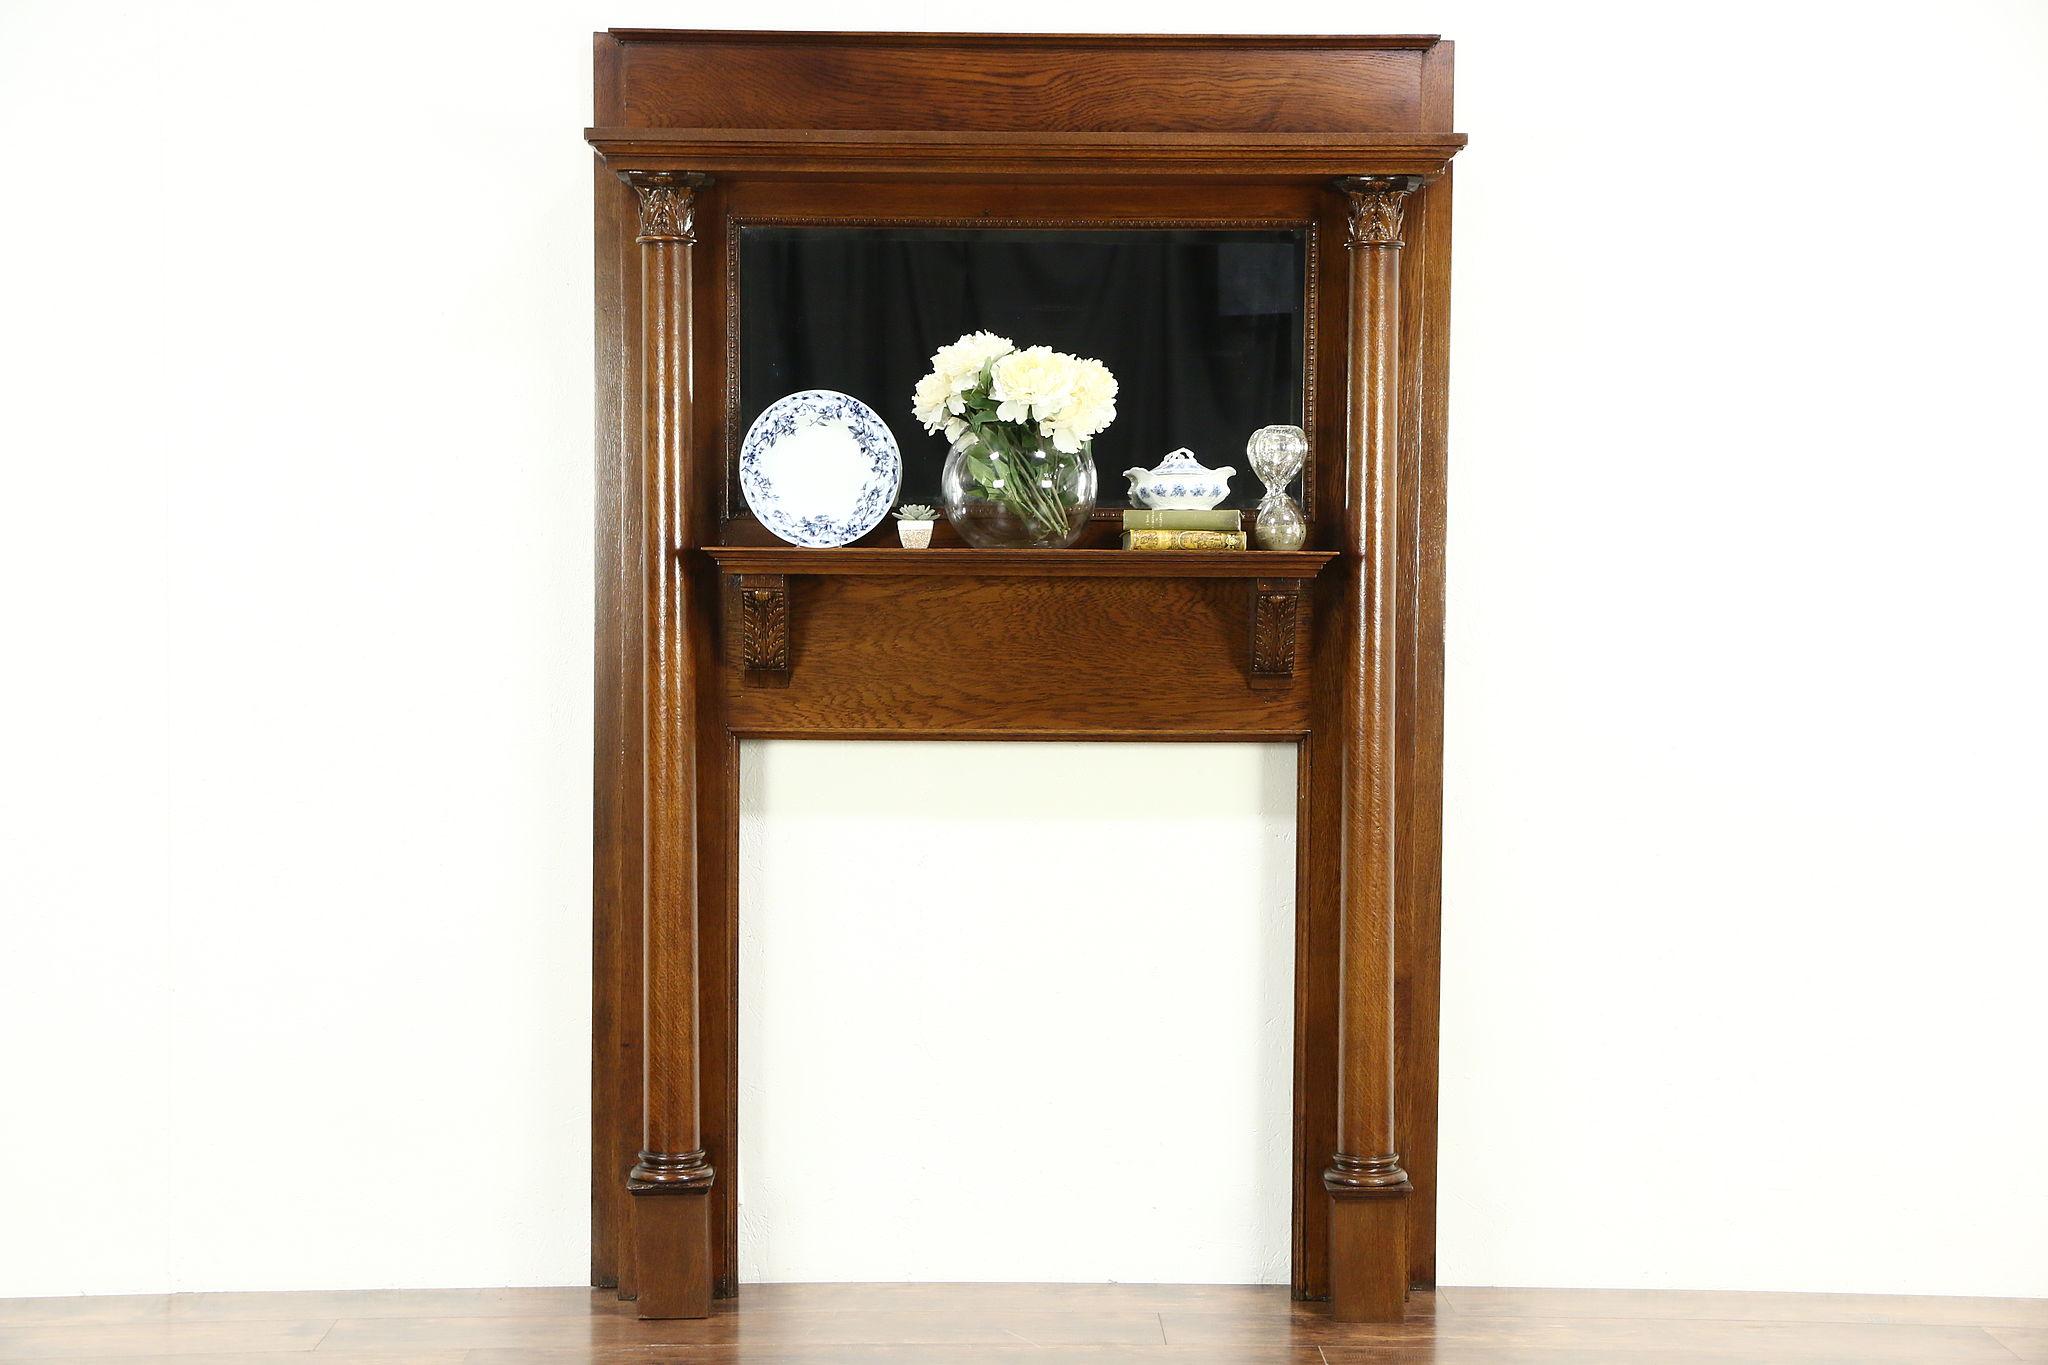 Victorian Oak Architectural Salvage Antique Fireplace Mantel Mirror